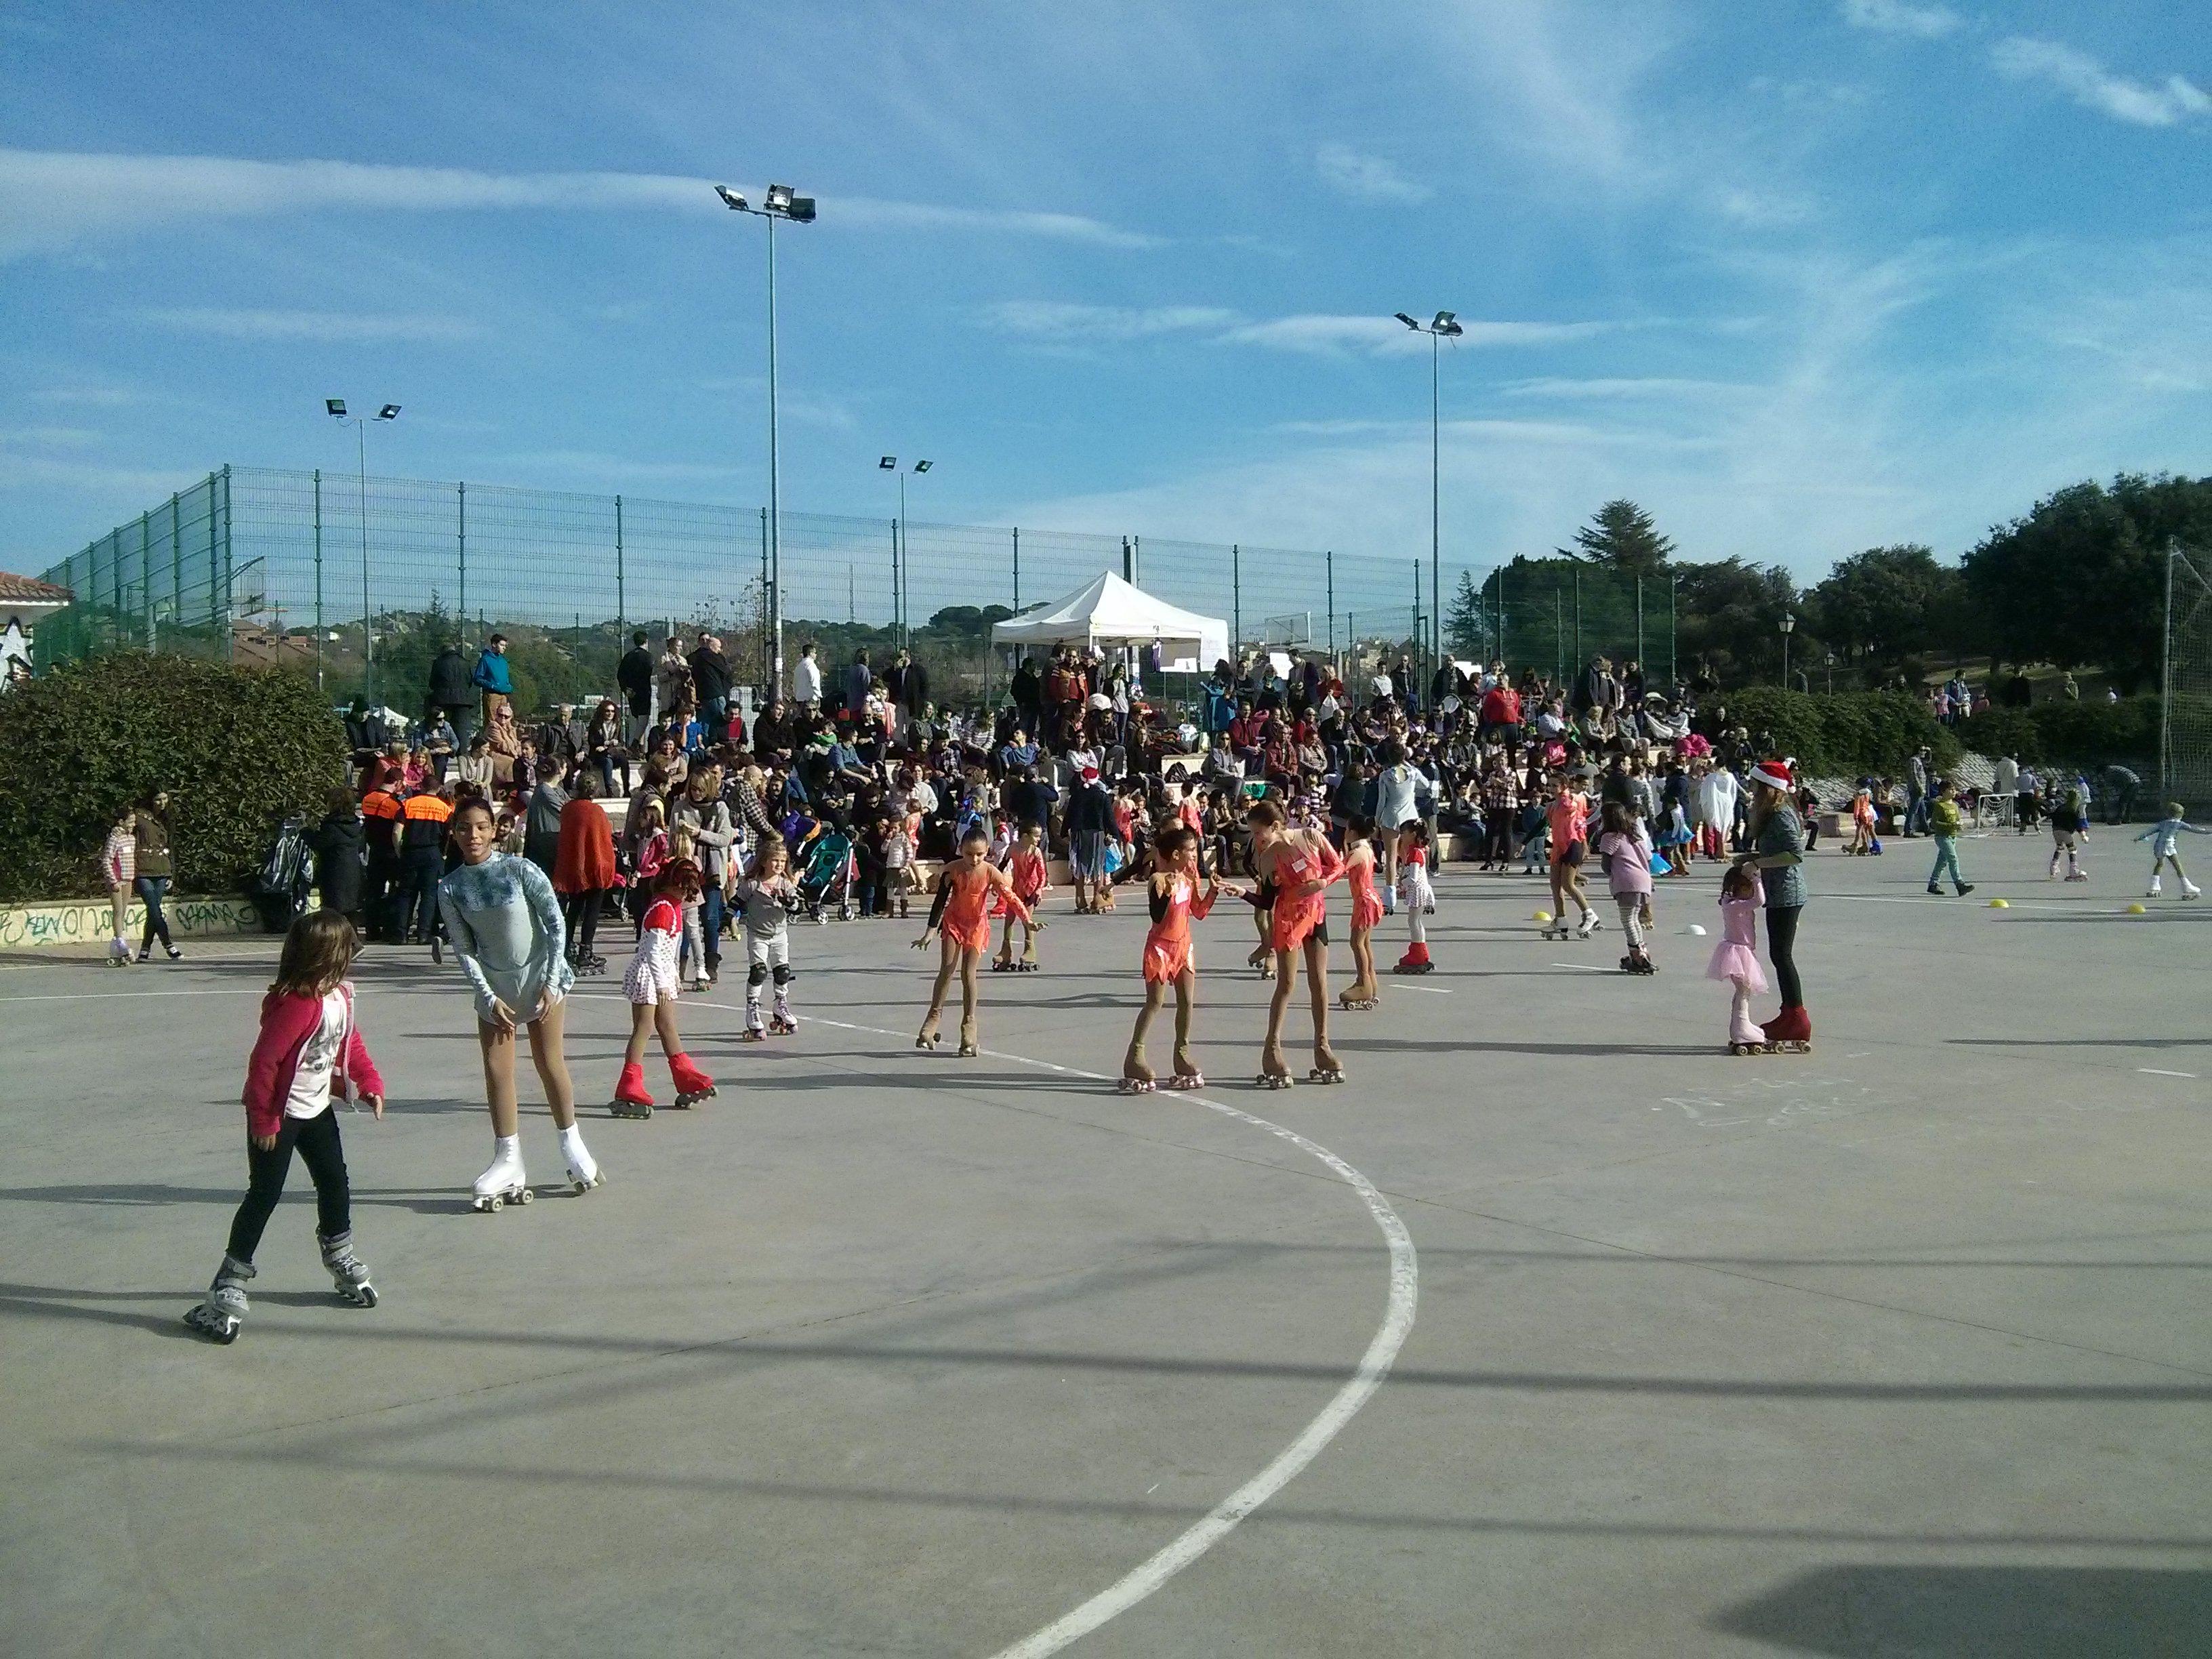 patín_Torrelodones_patinaje5.jpg